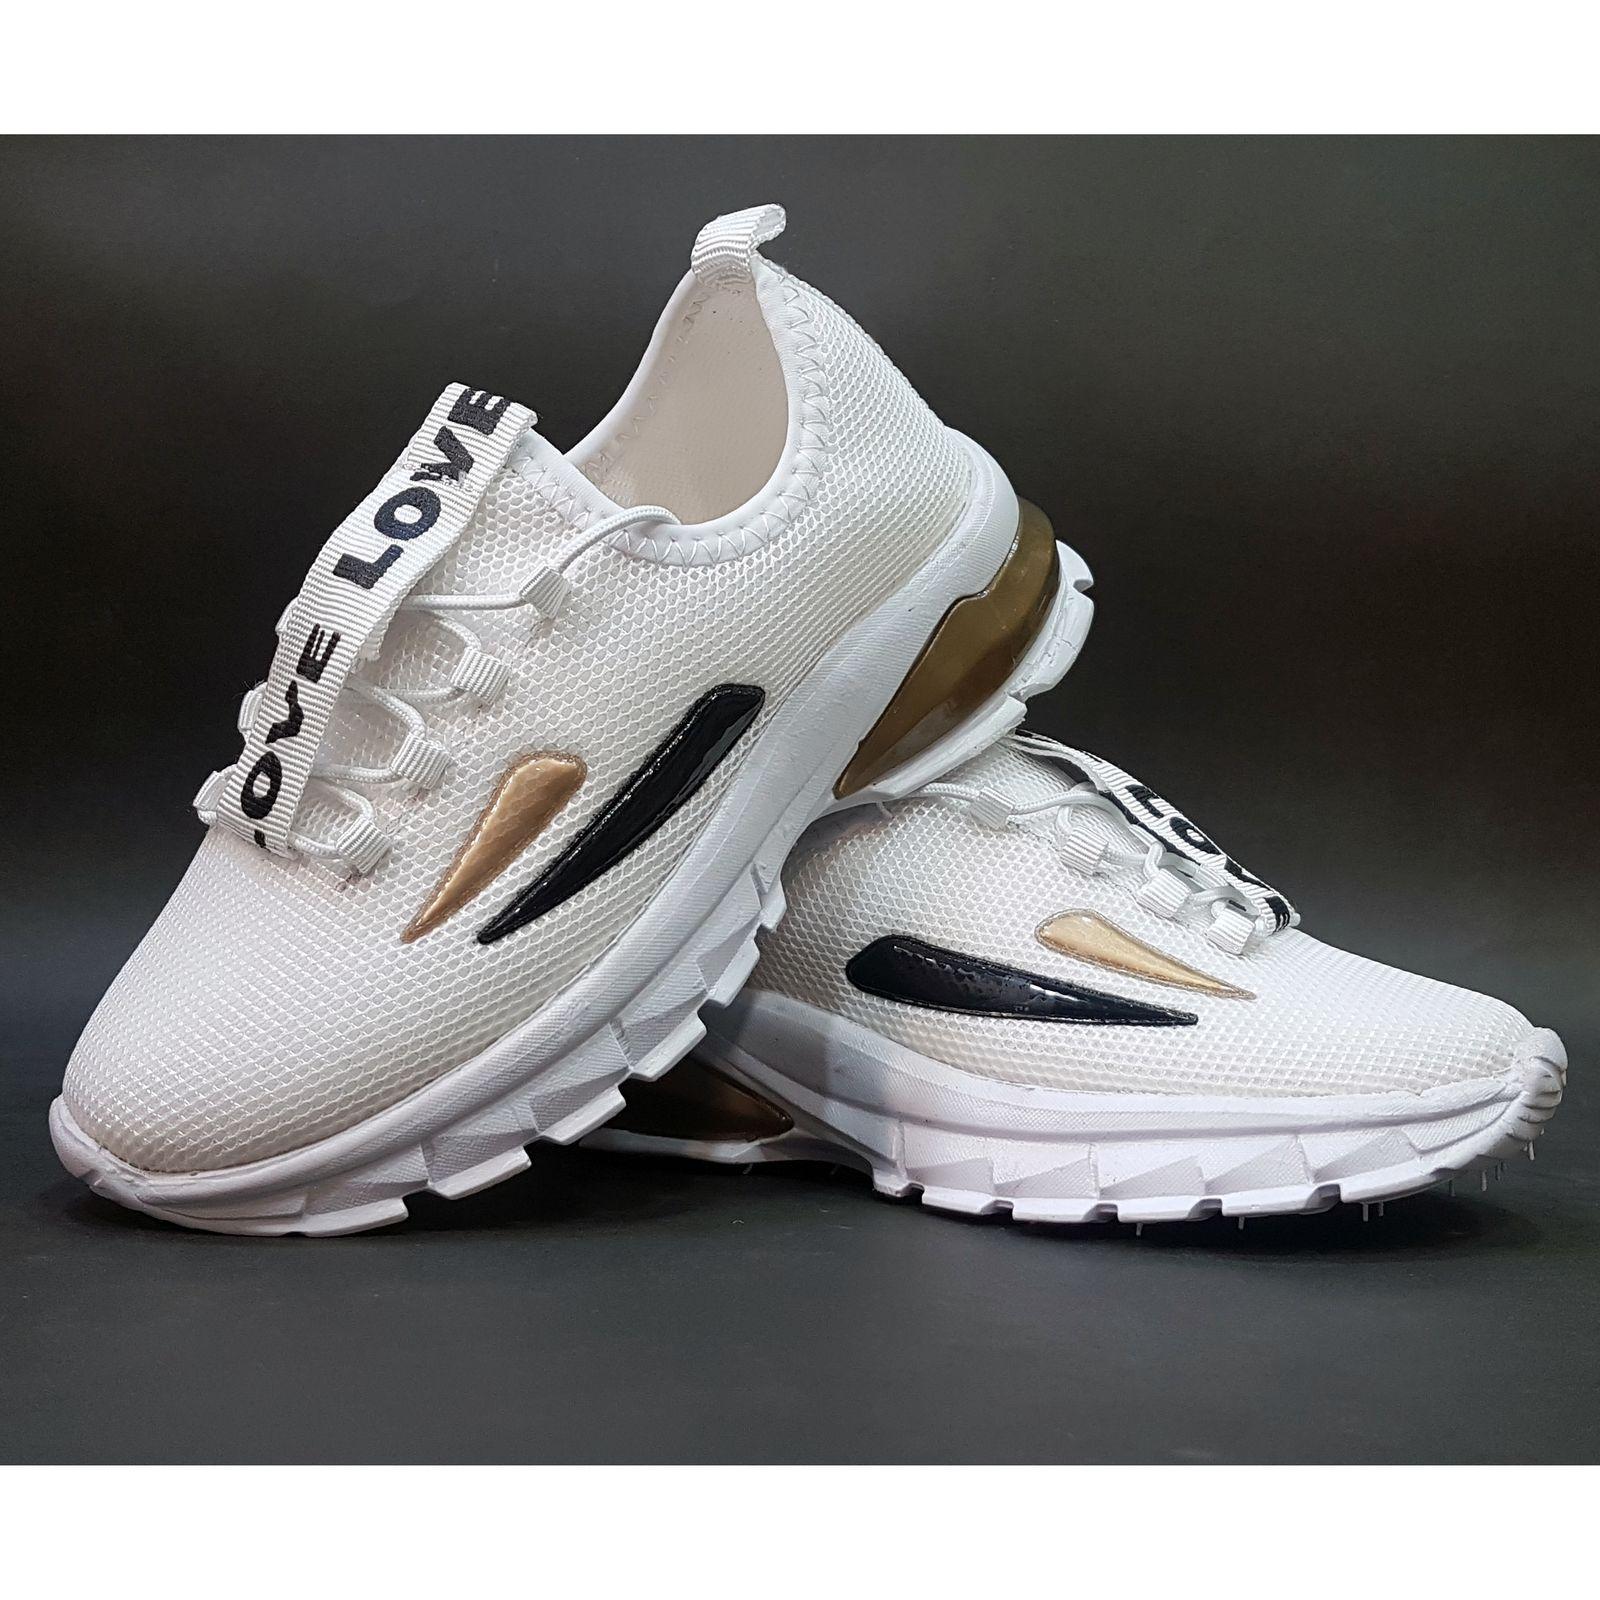 کفش پیاده روی پسرانه کد 3328090 -  - 6